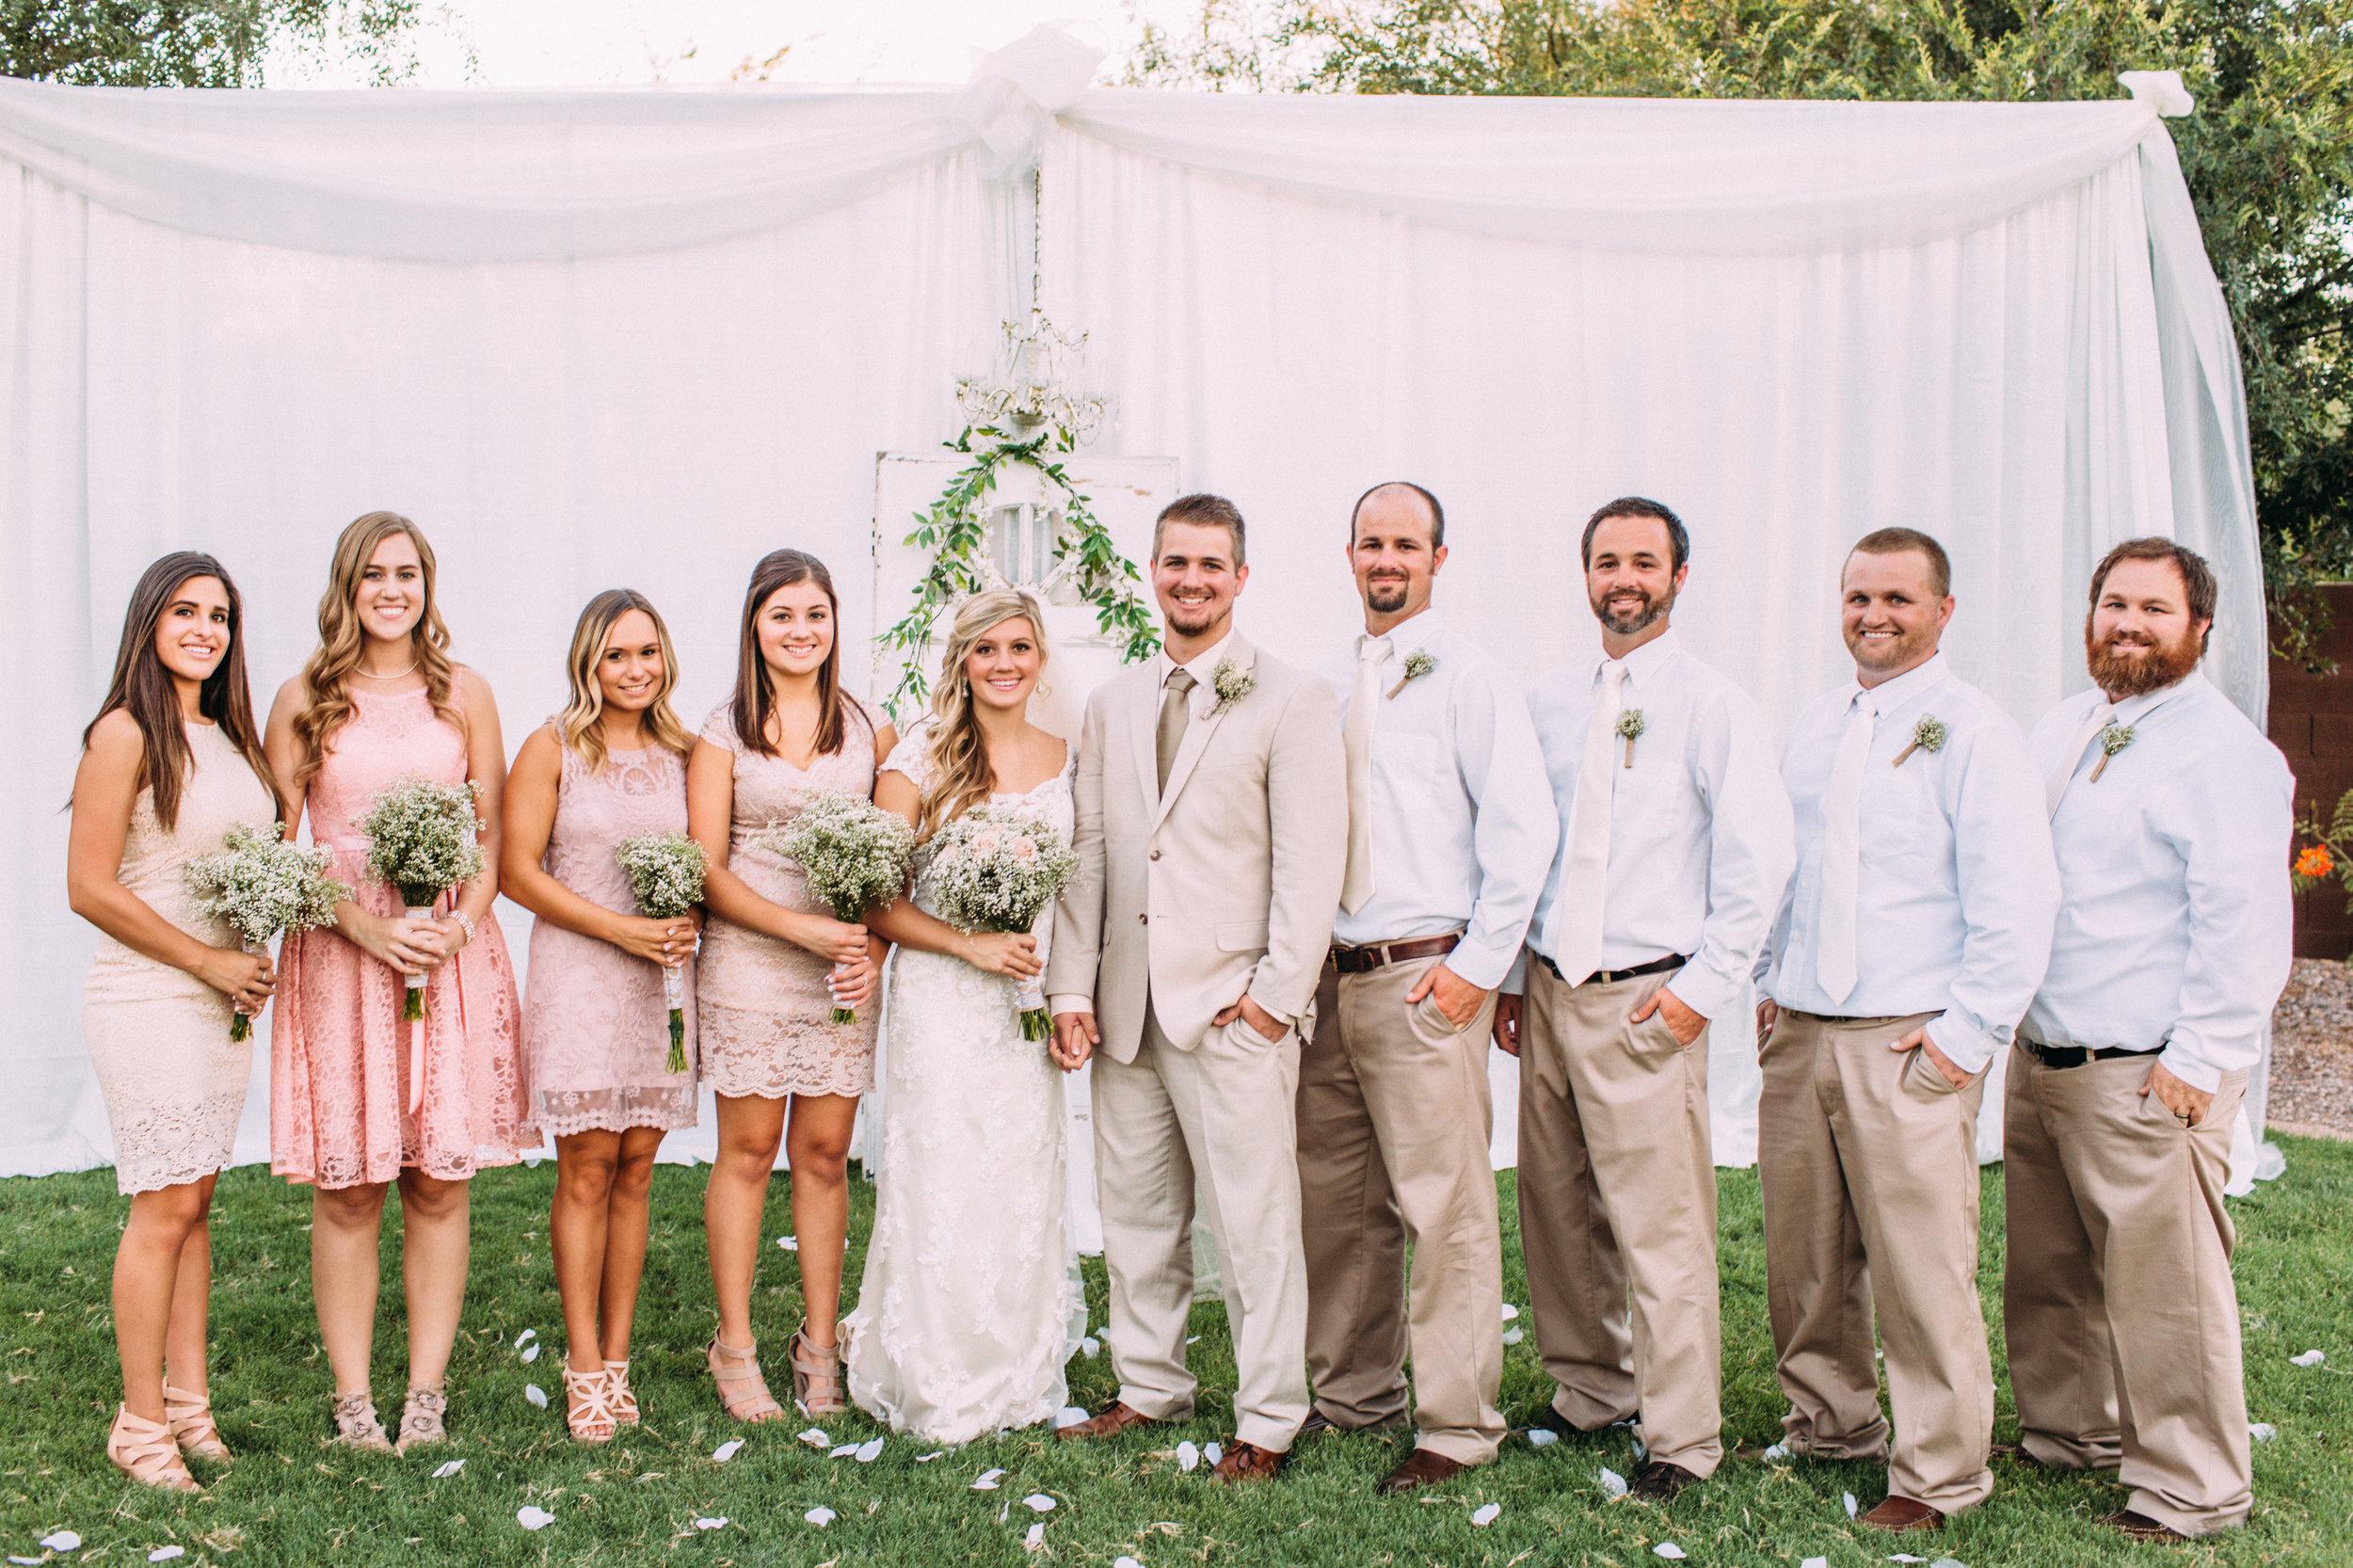 Backyard Wedding at Bride's Childhood Home in Gilbert, Arizona- Konsider It Done- AZ Arizona Wedding & Event Planner, Designer, Coordinator Planning in Scottsdale, Phoenix, Paradise Valley, Tempe, Gilbert, Mesa, Chandler, Tucson, Sedona